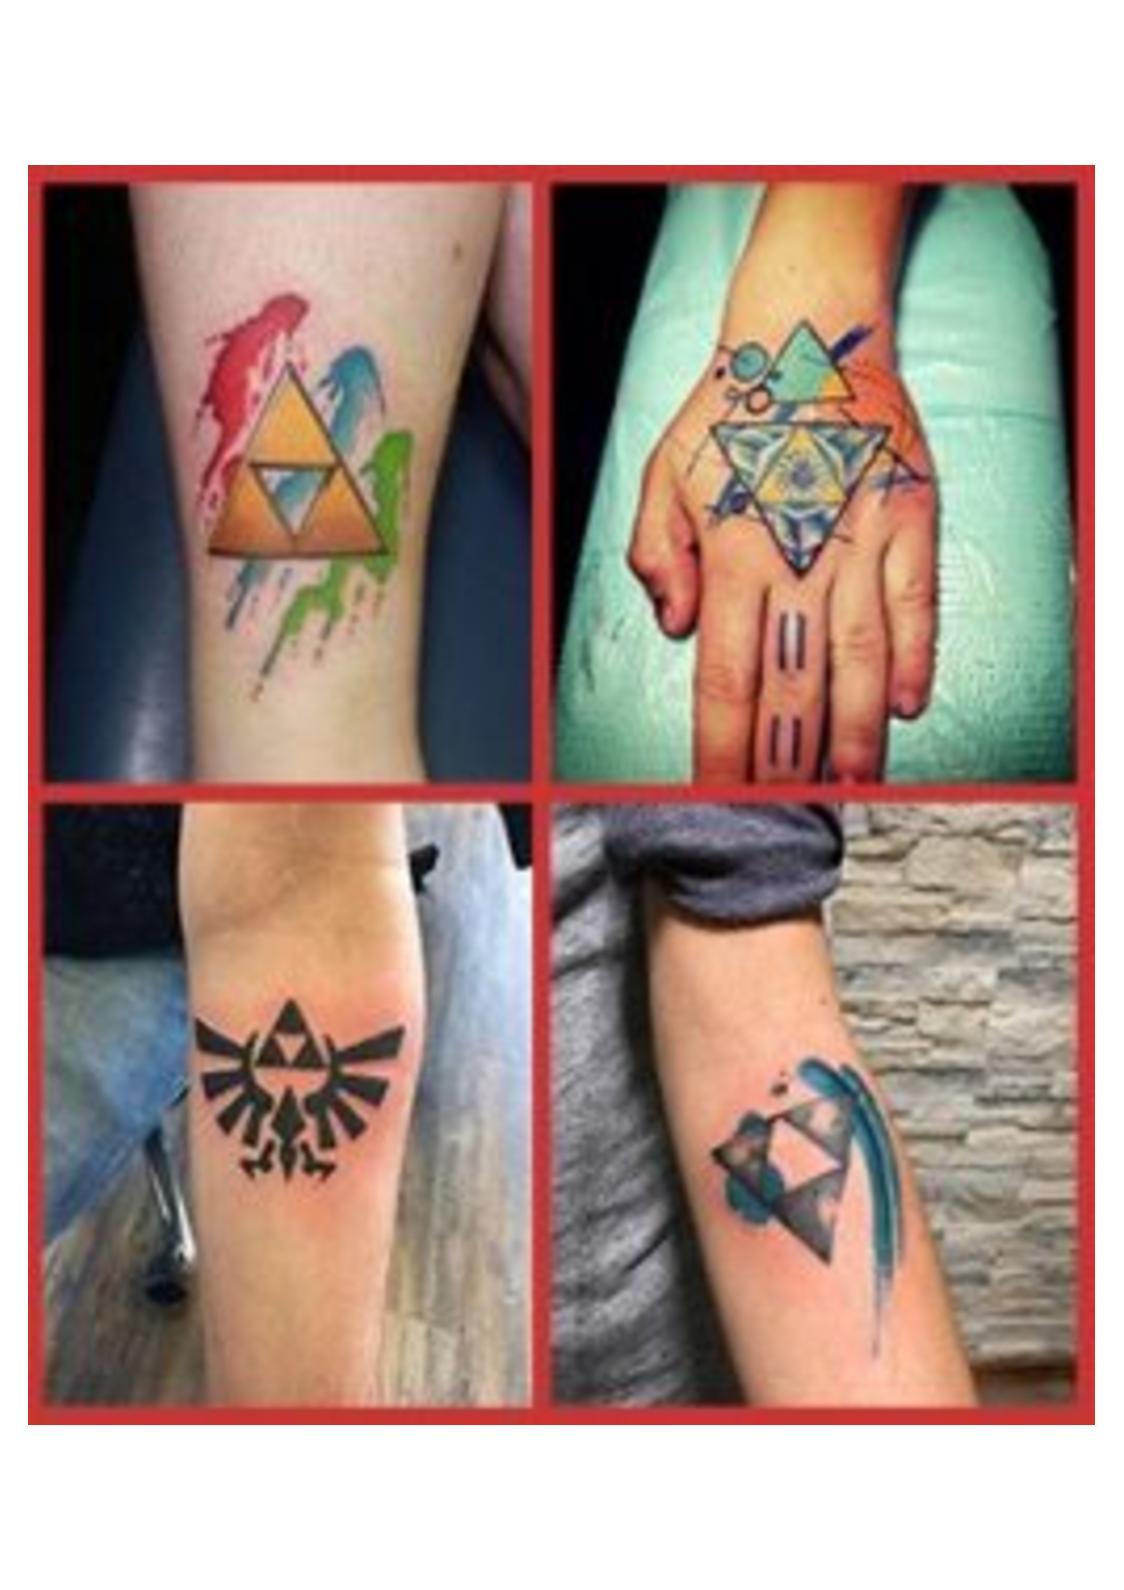 Triforce Tattoo : triforce, tattoo, Calaméo, Triforce, Tattoo, 254x300, Dönüştürüldü